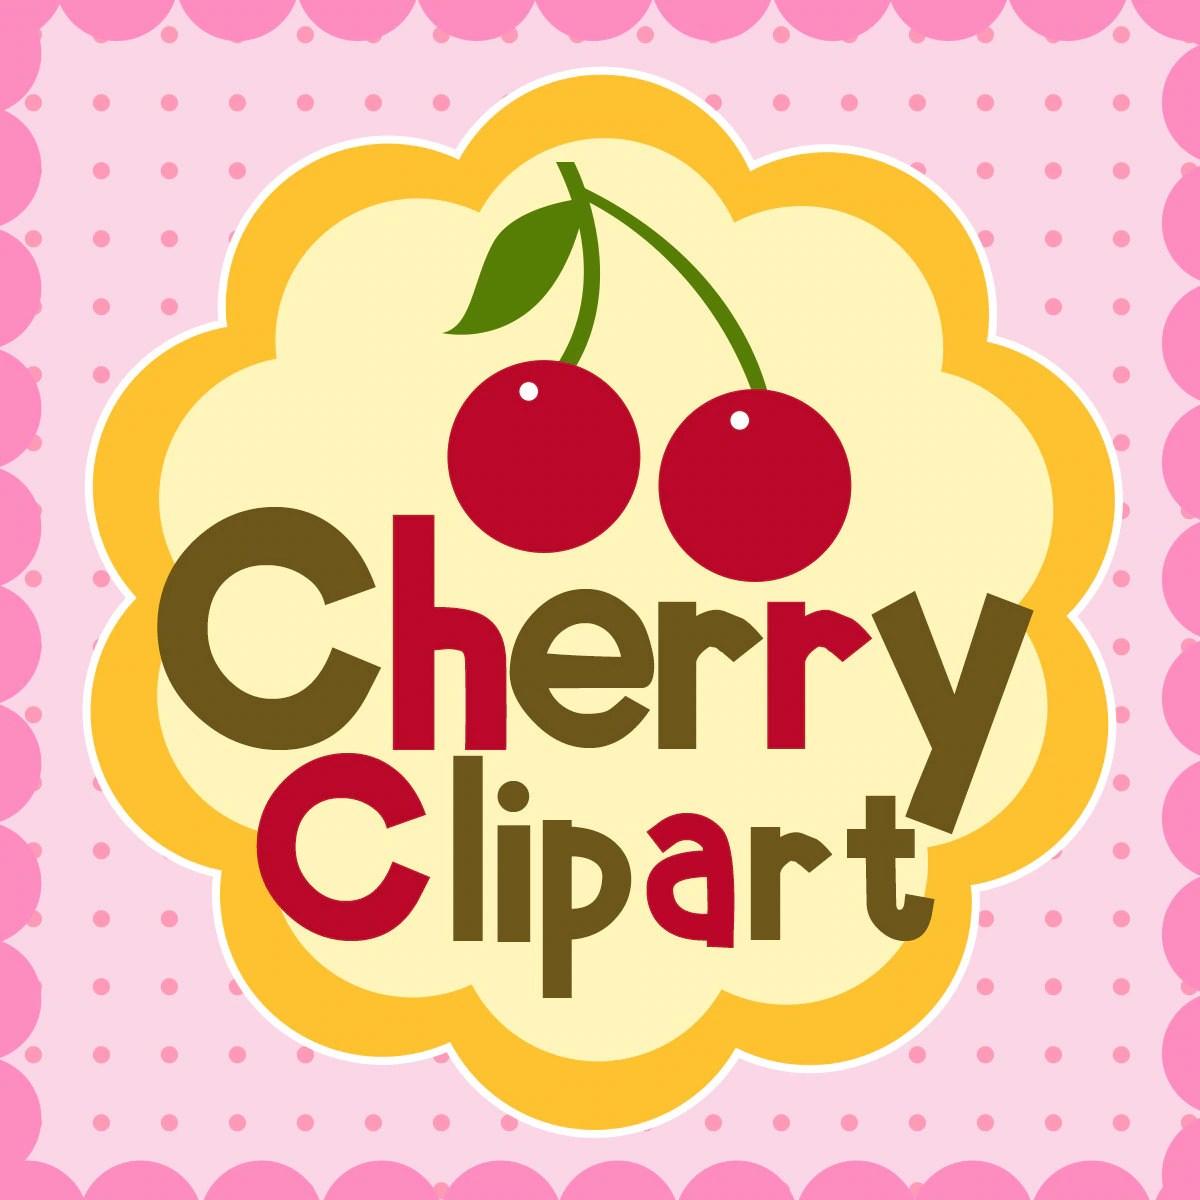 medium resolution of cherry clipart